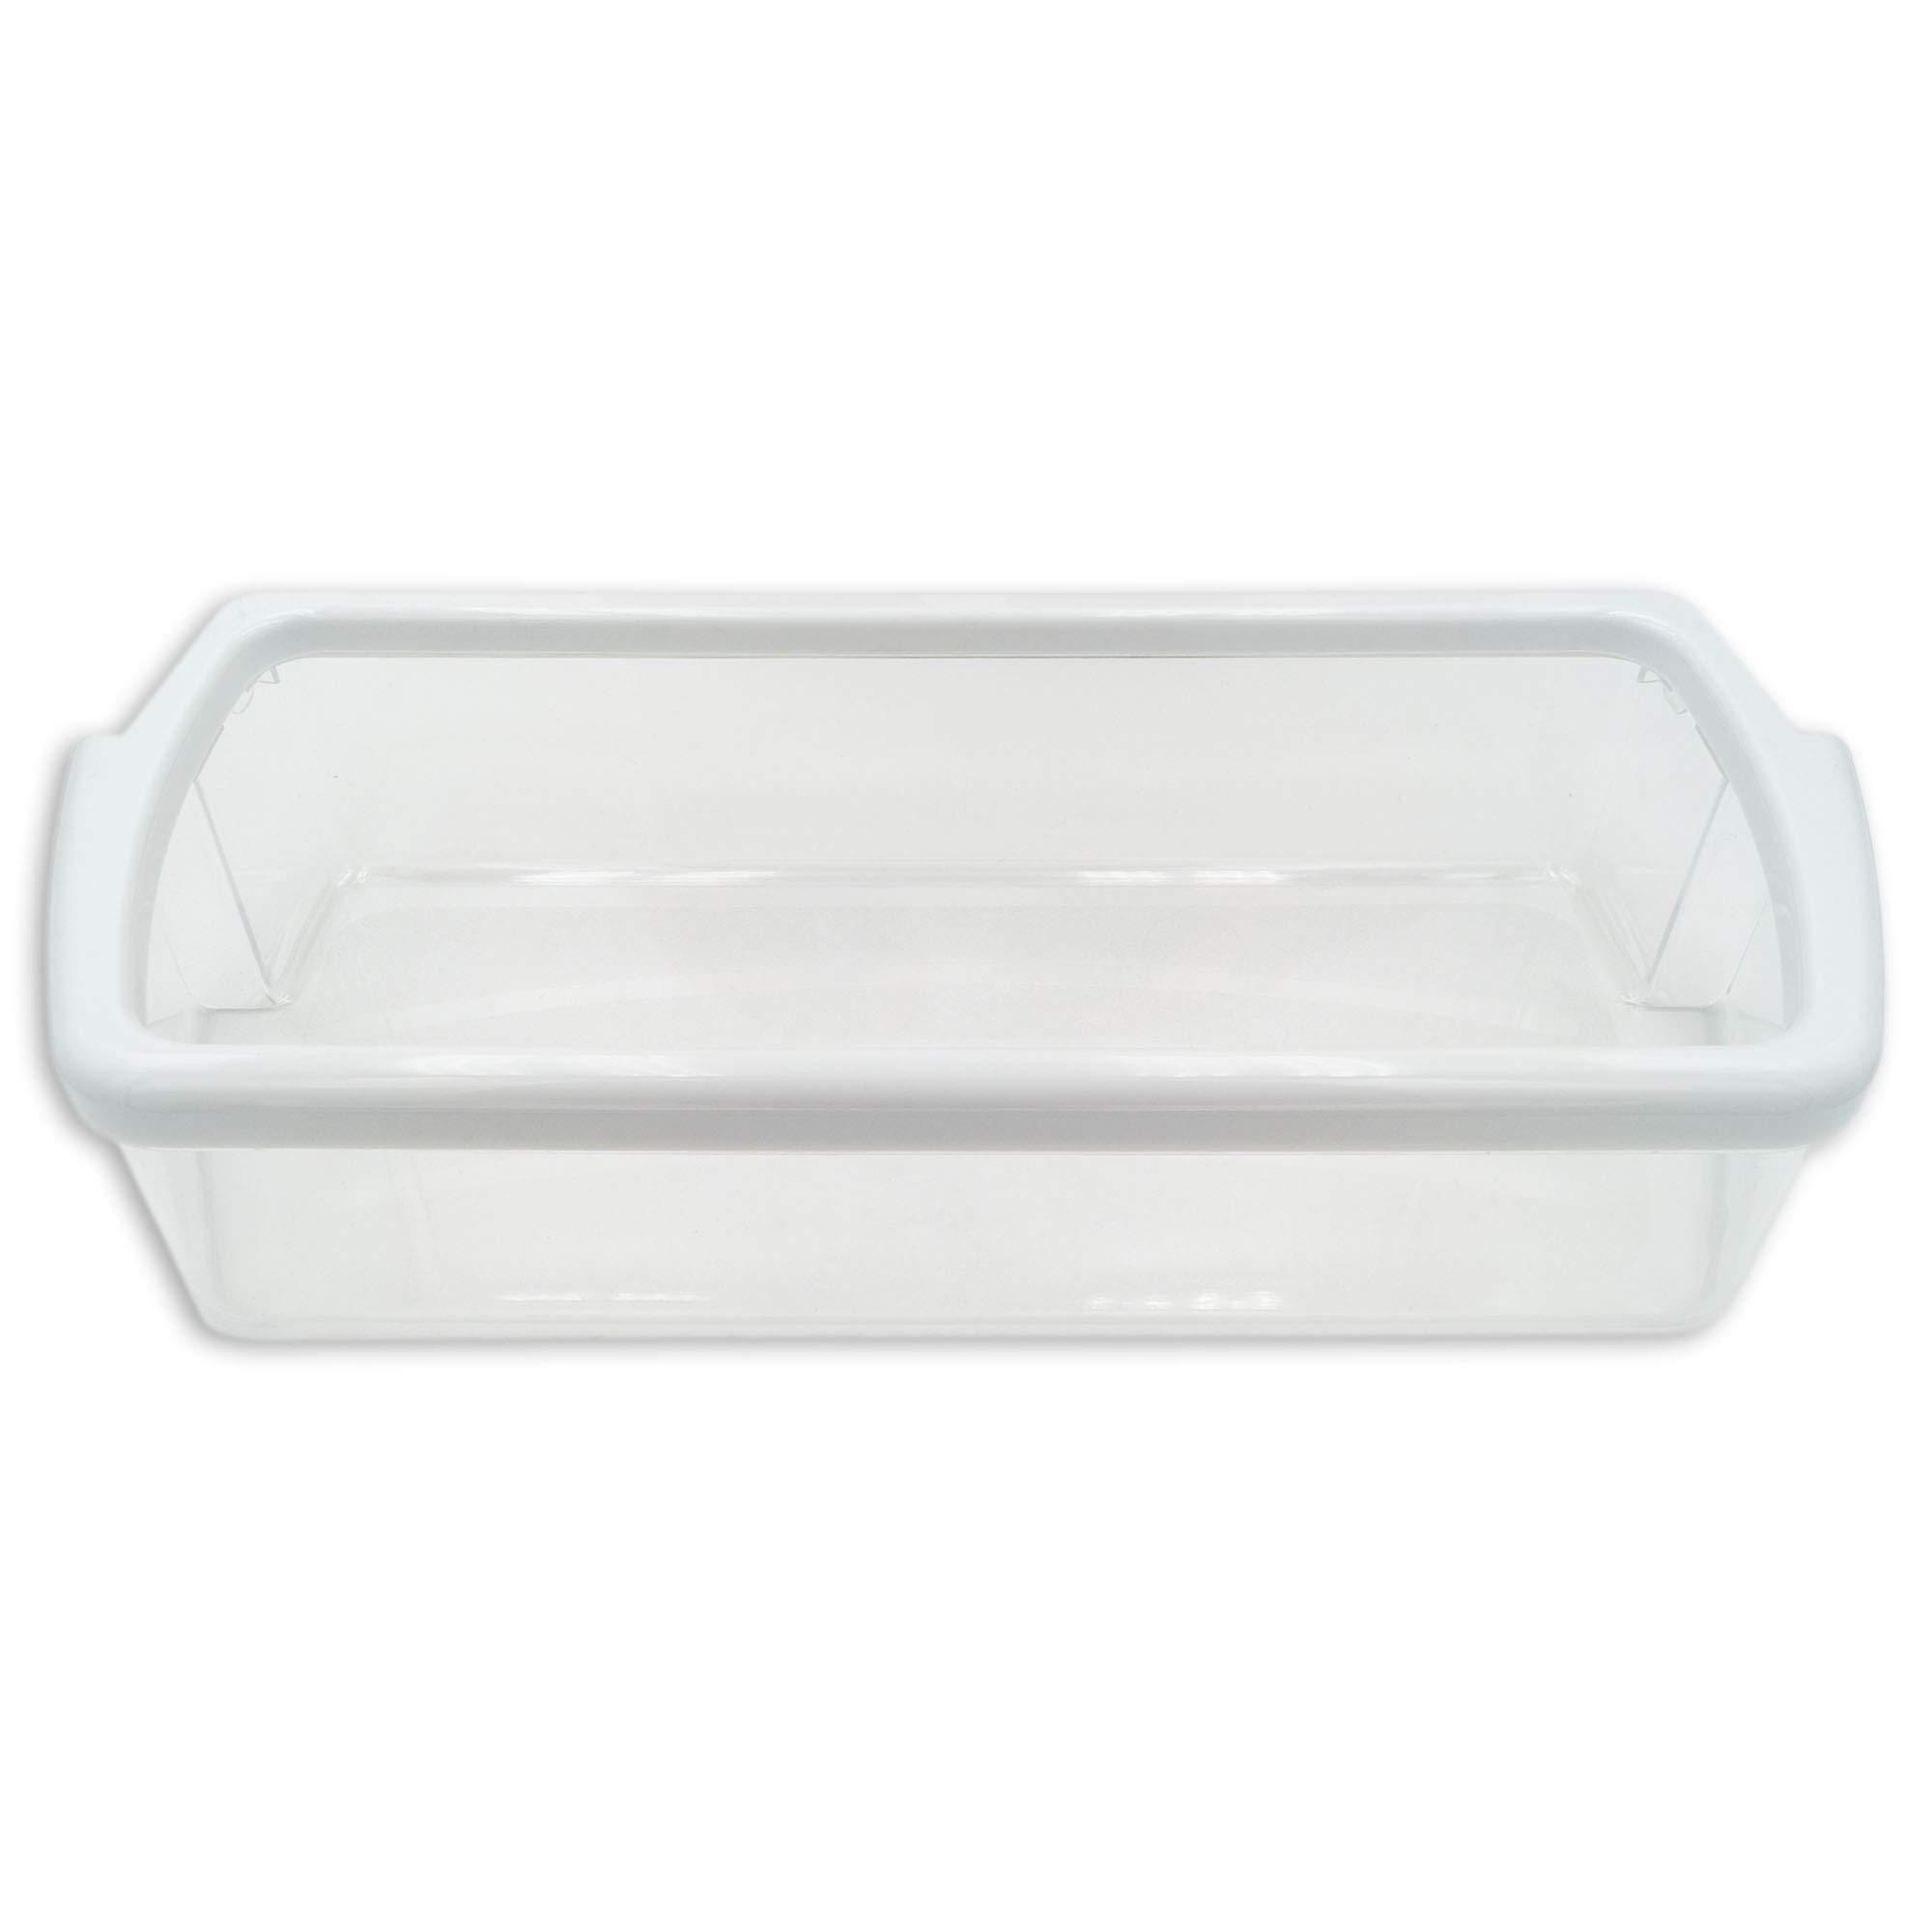 Supplying Demand SDW10321304 Refrigerator Door Bin Fits Whirlpool W10321304